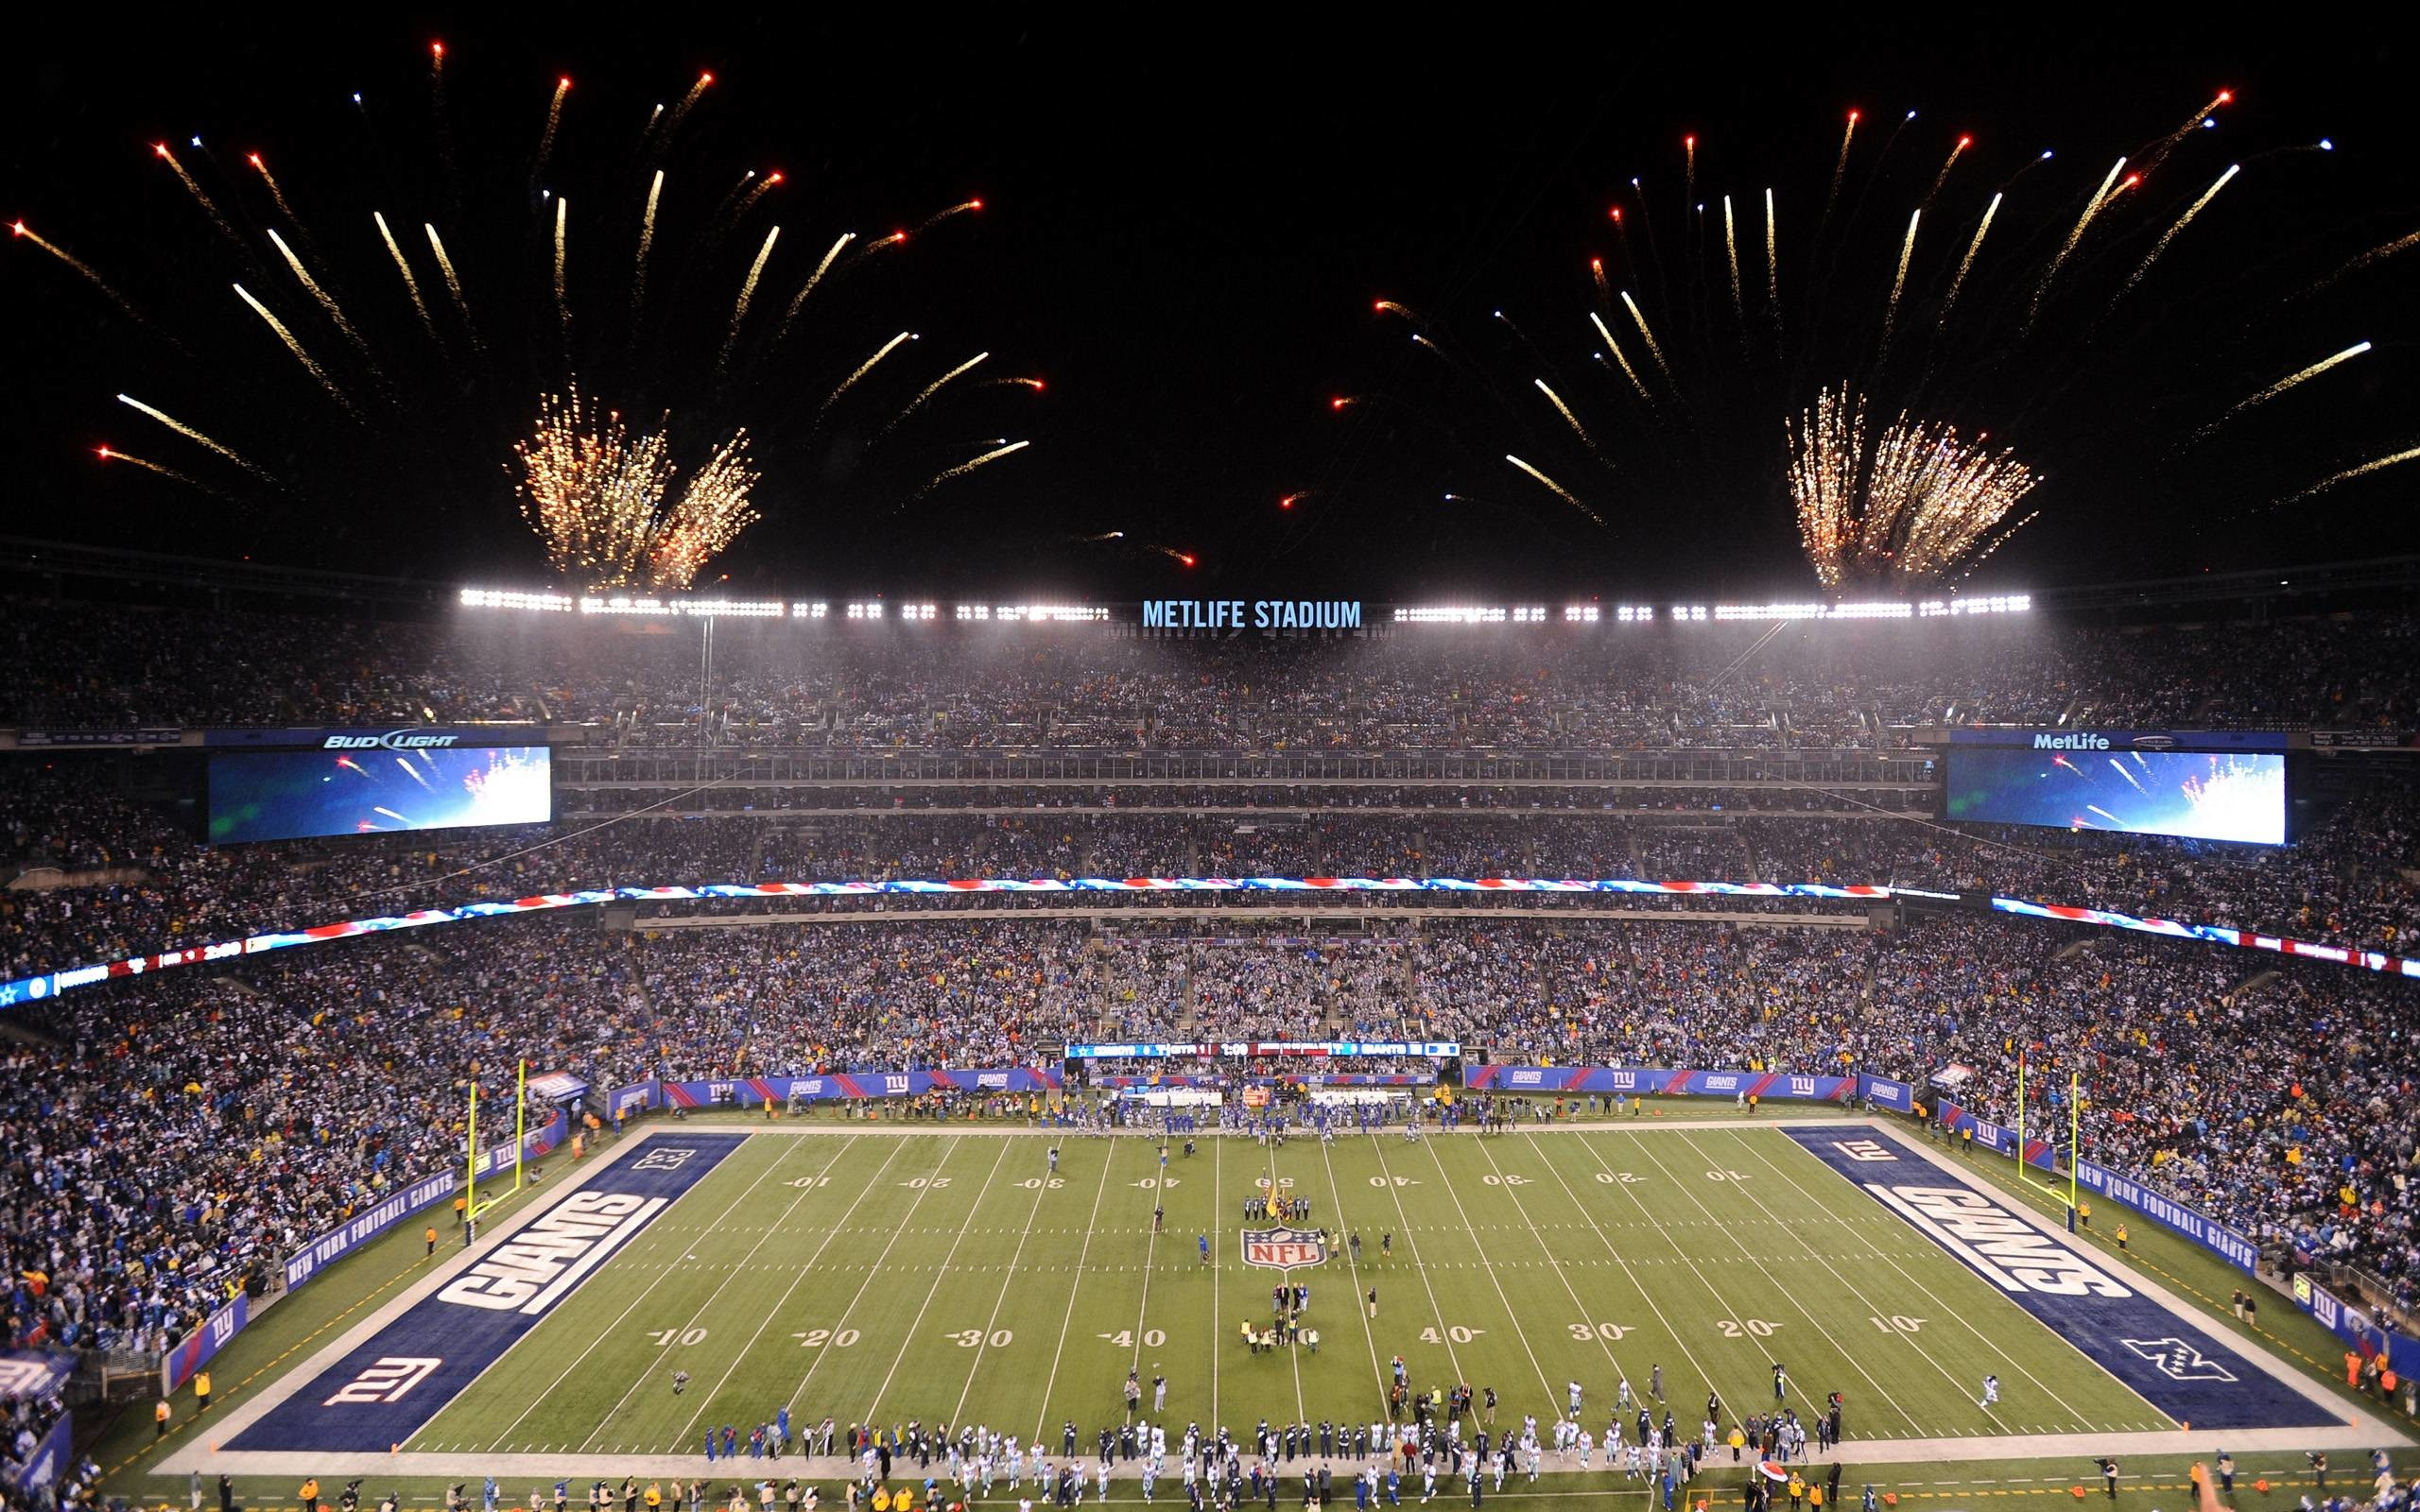 New York Giants Metlife Stadium wallpaper